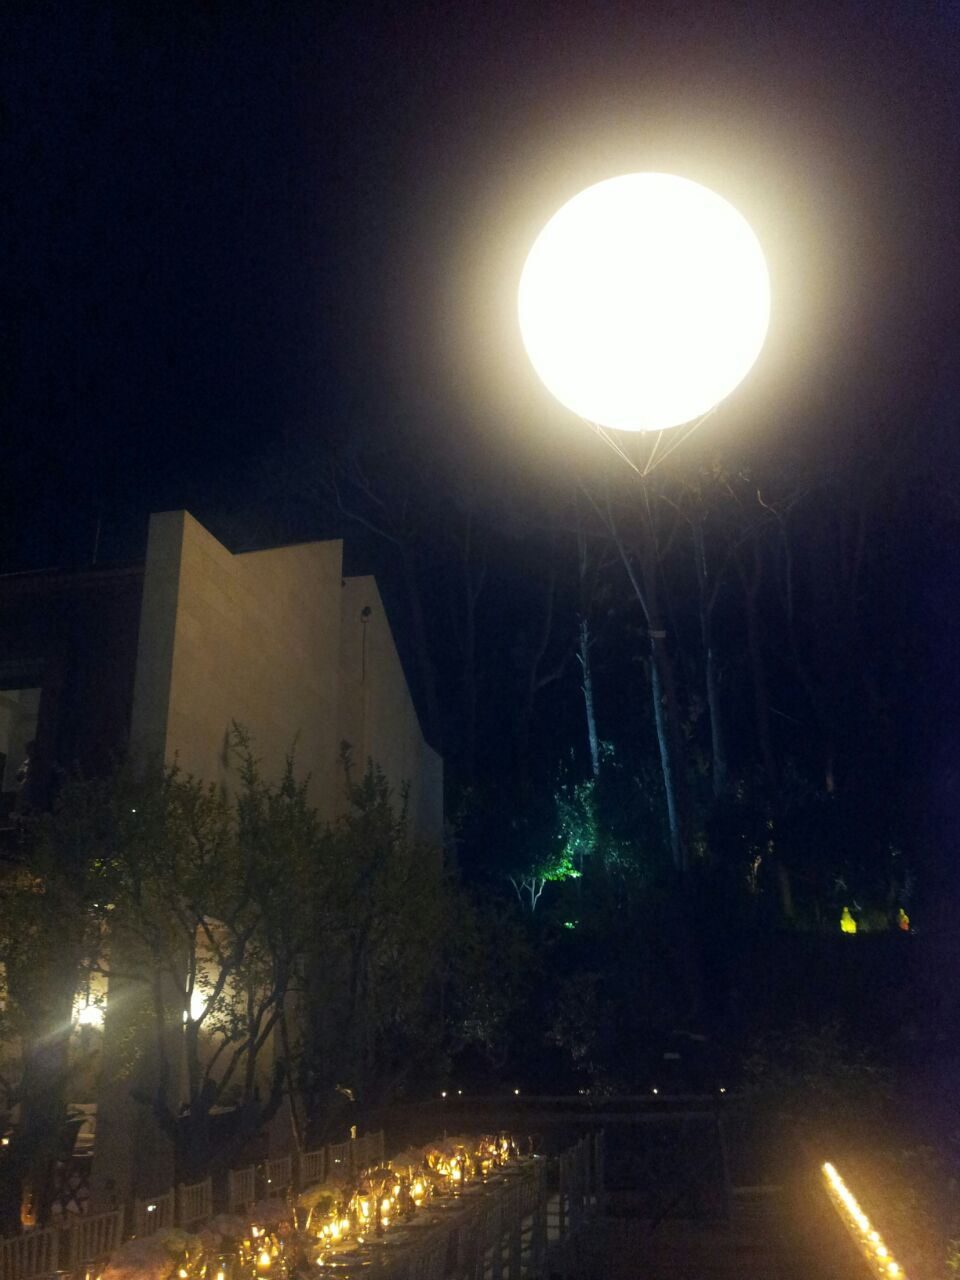 Moon Light Flying Balloon | Clients